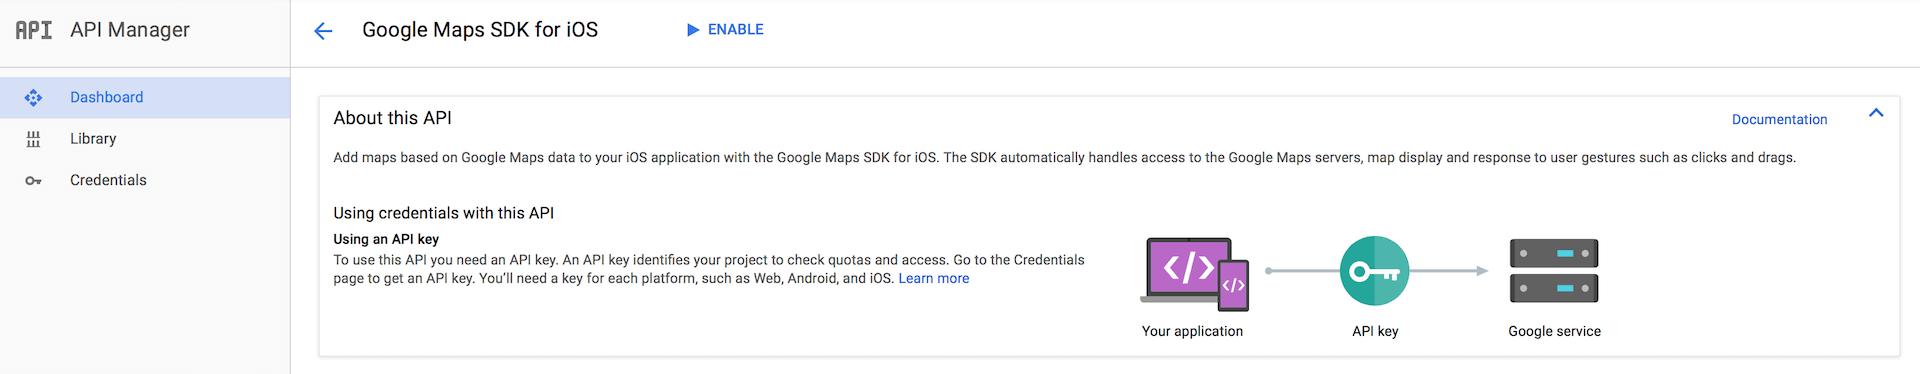 enable-google-maps-api